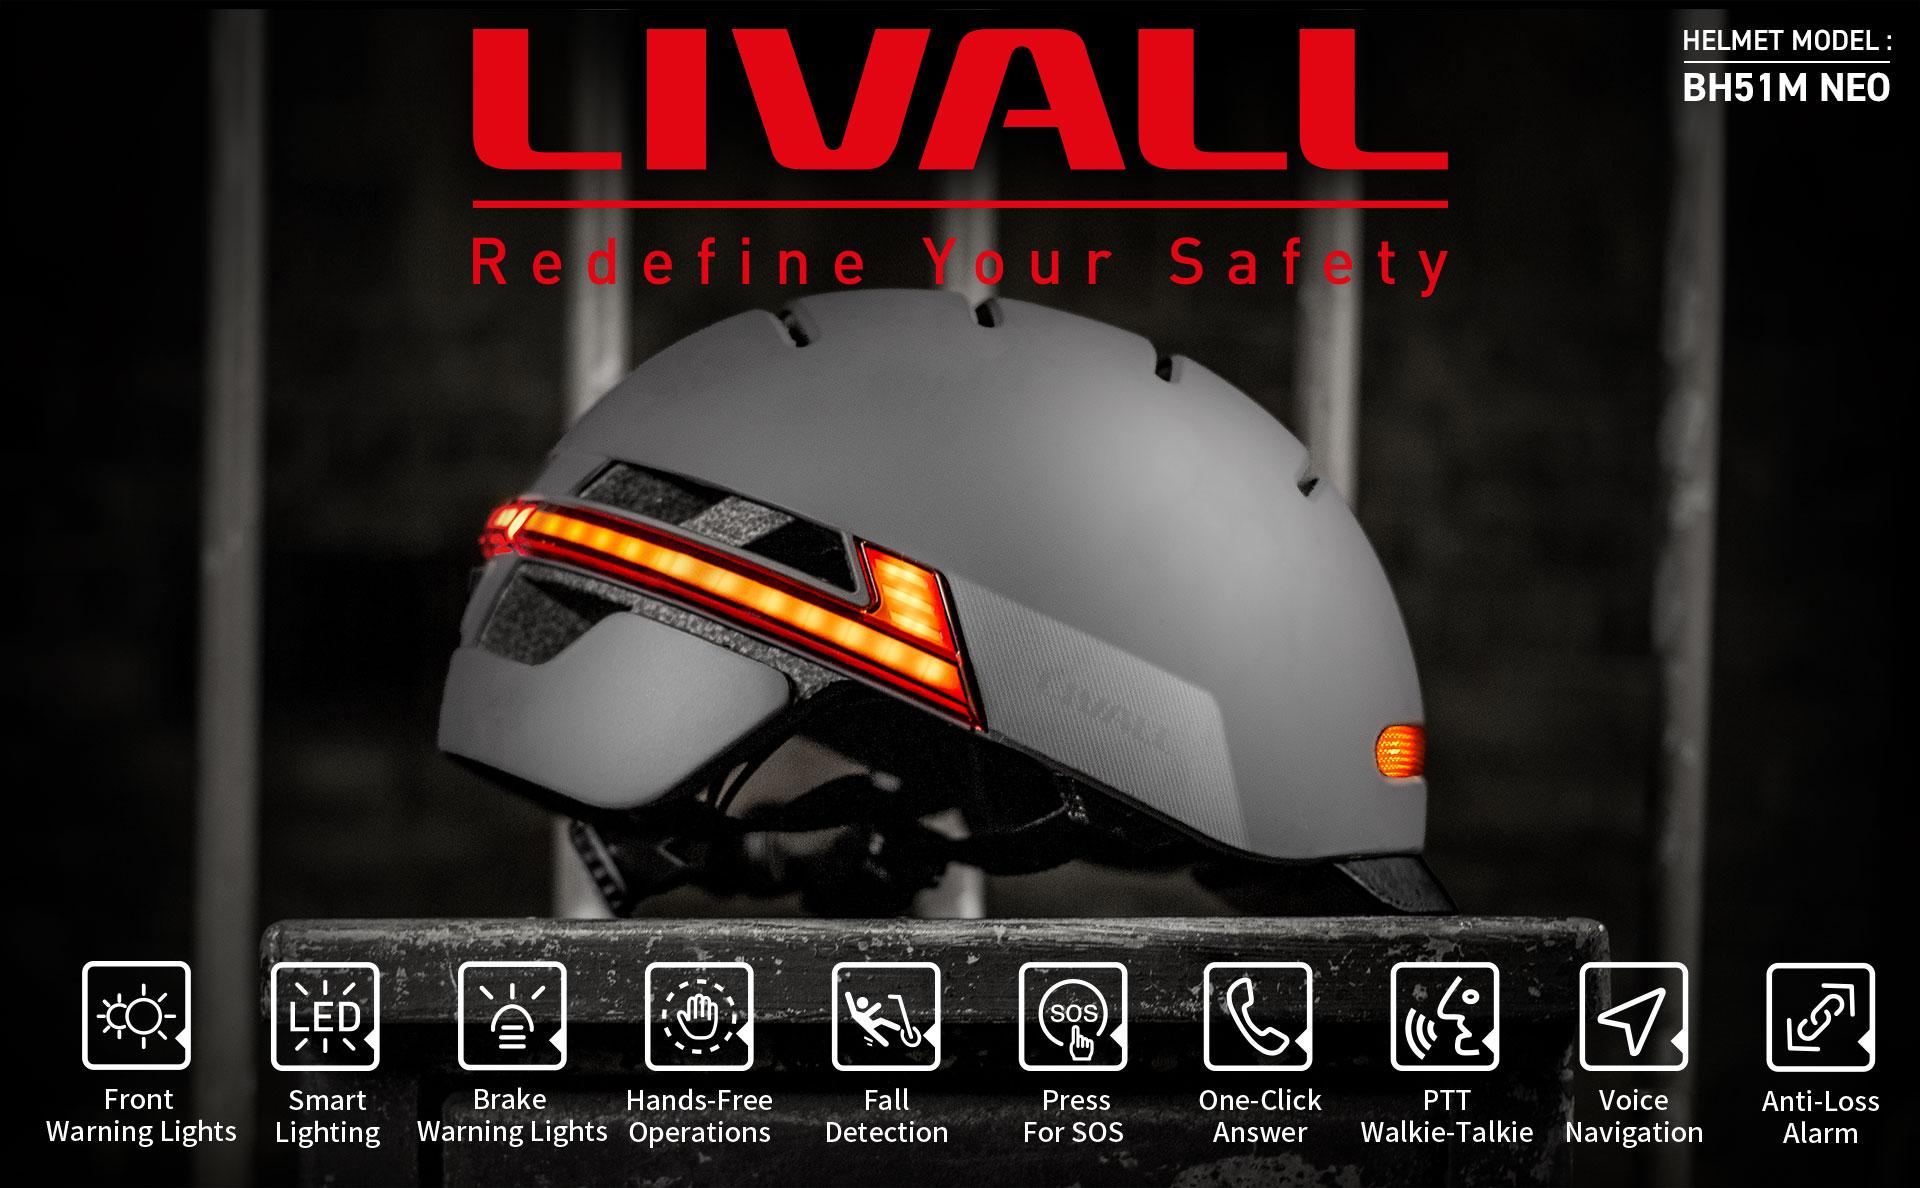 LIVALL-BH51M-NEO-Banner